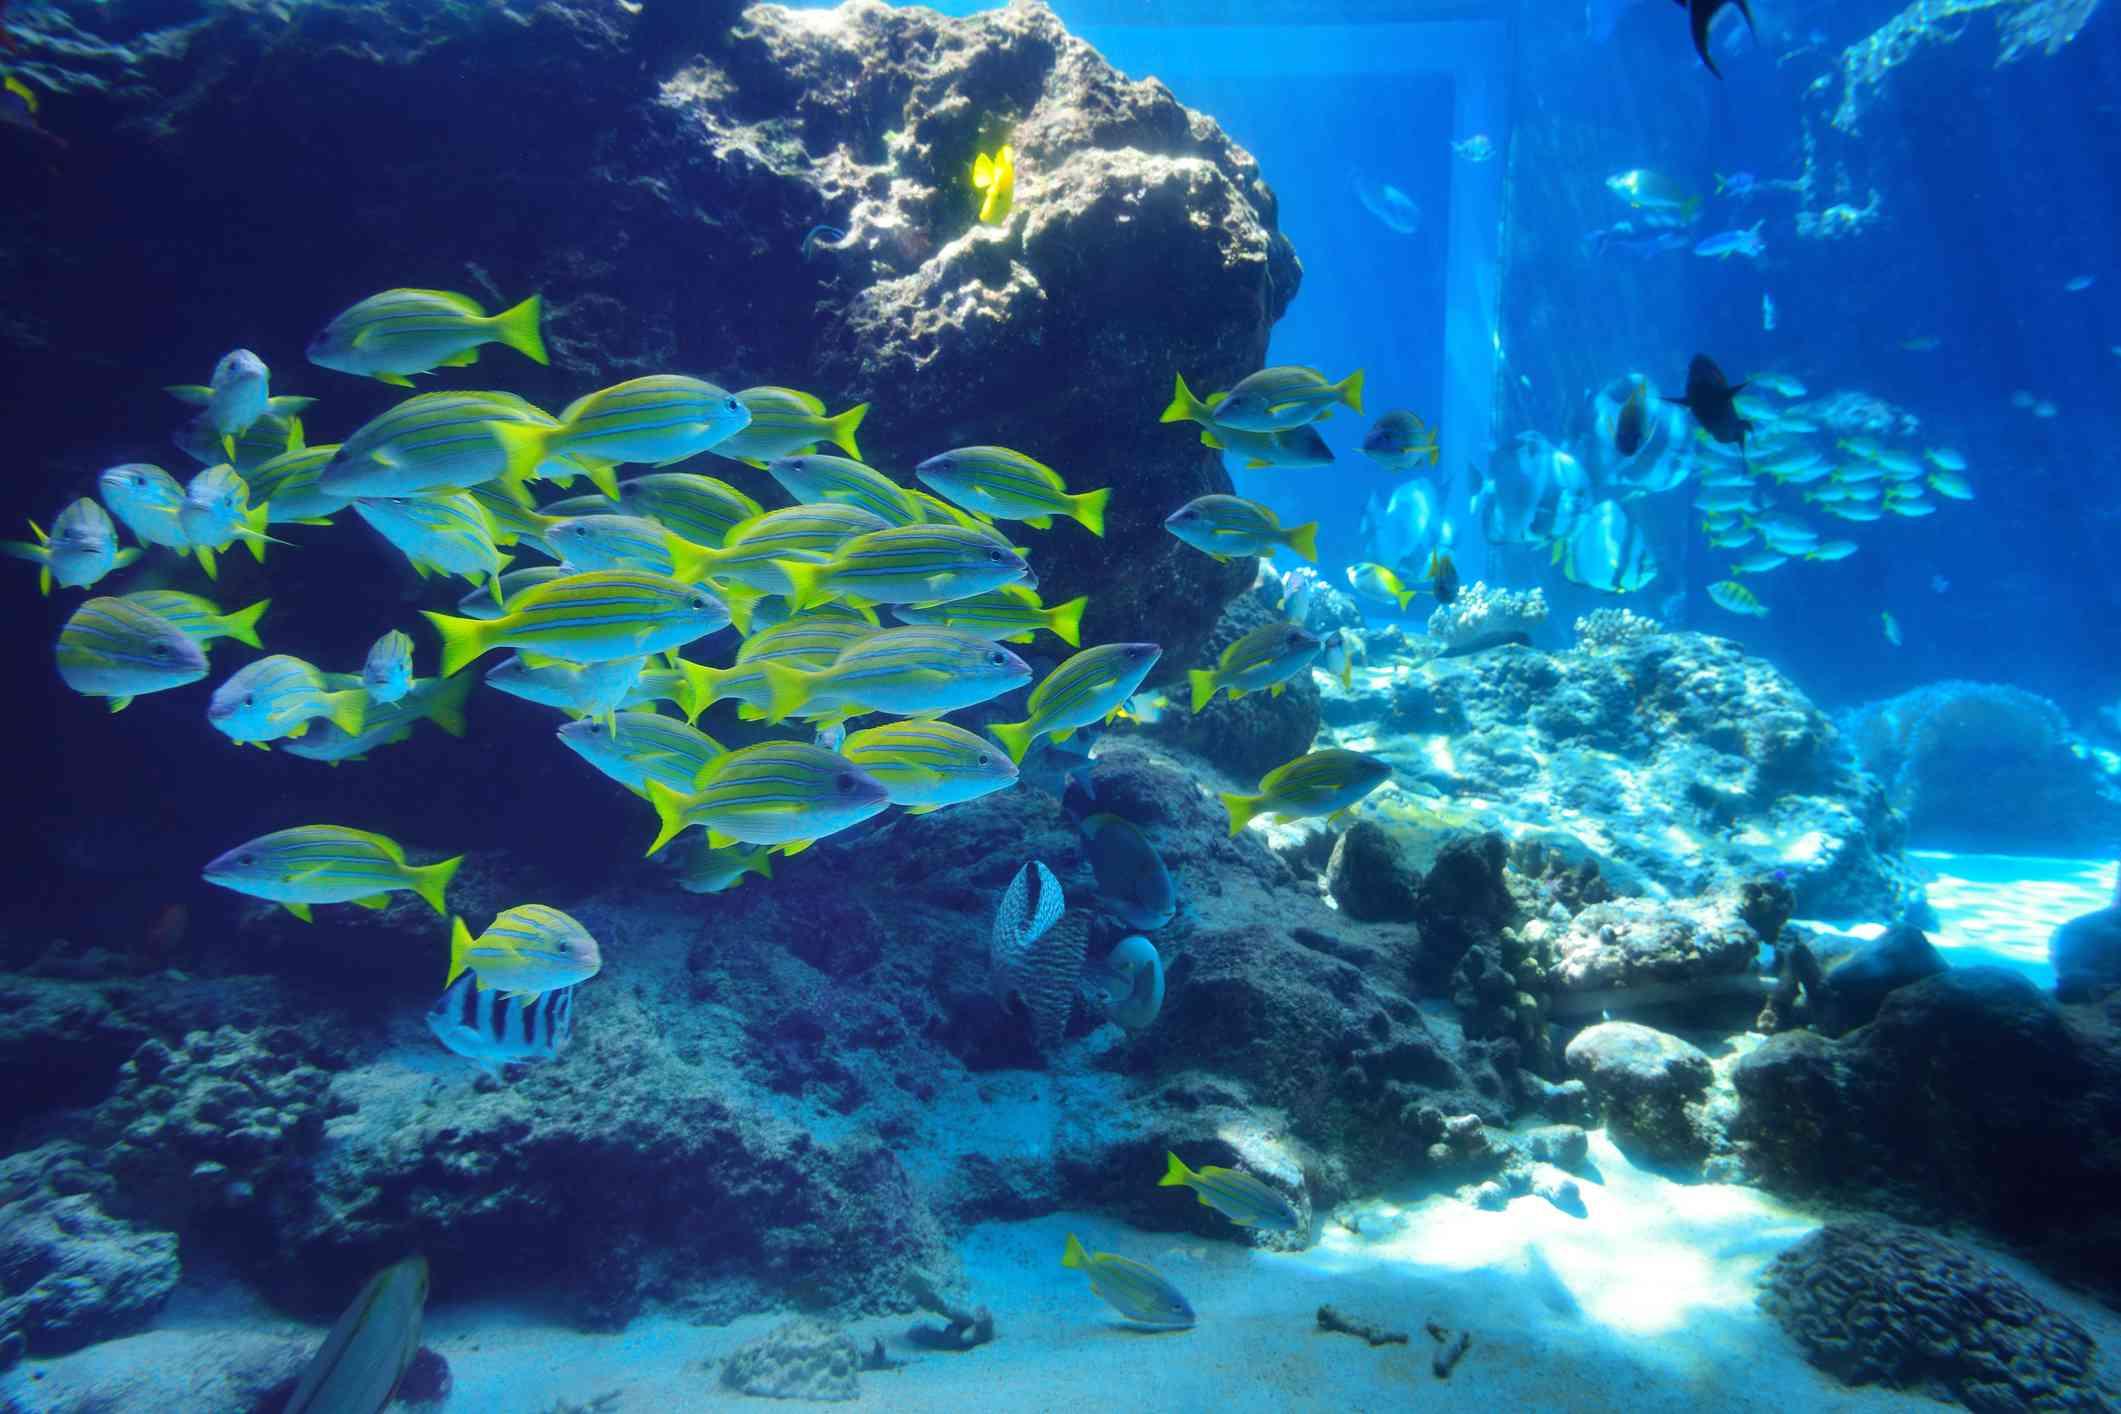 School of blue and yellow fish near a rock and sandy bottom at Churaumi Aquarium